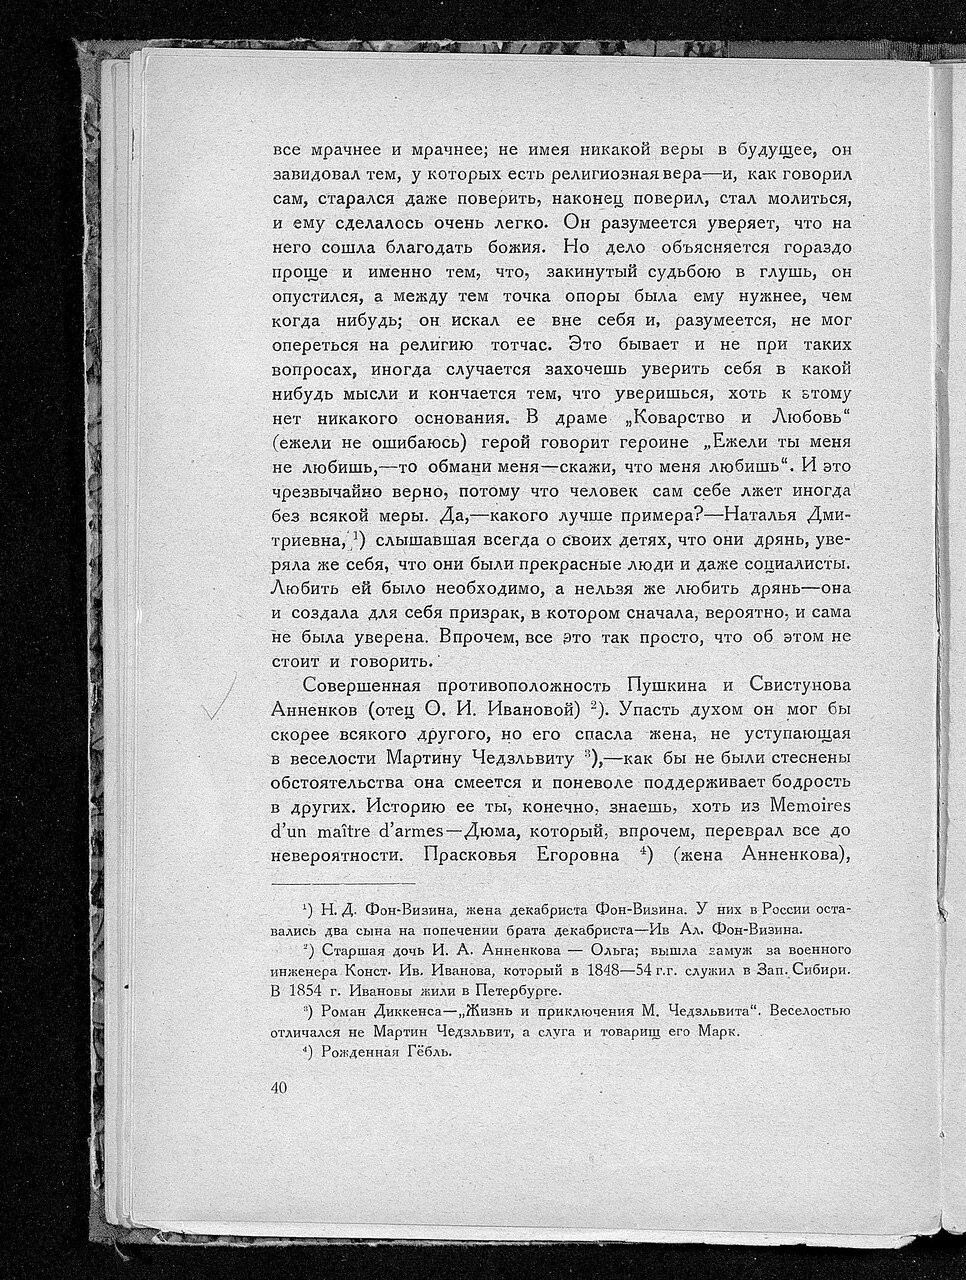 https://img-fotki.yandex.ru/get/880375/199368979.a0/0_214323_197bb3cb_XXXL.jpg